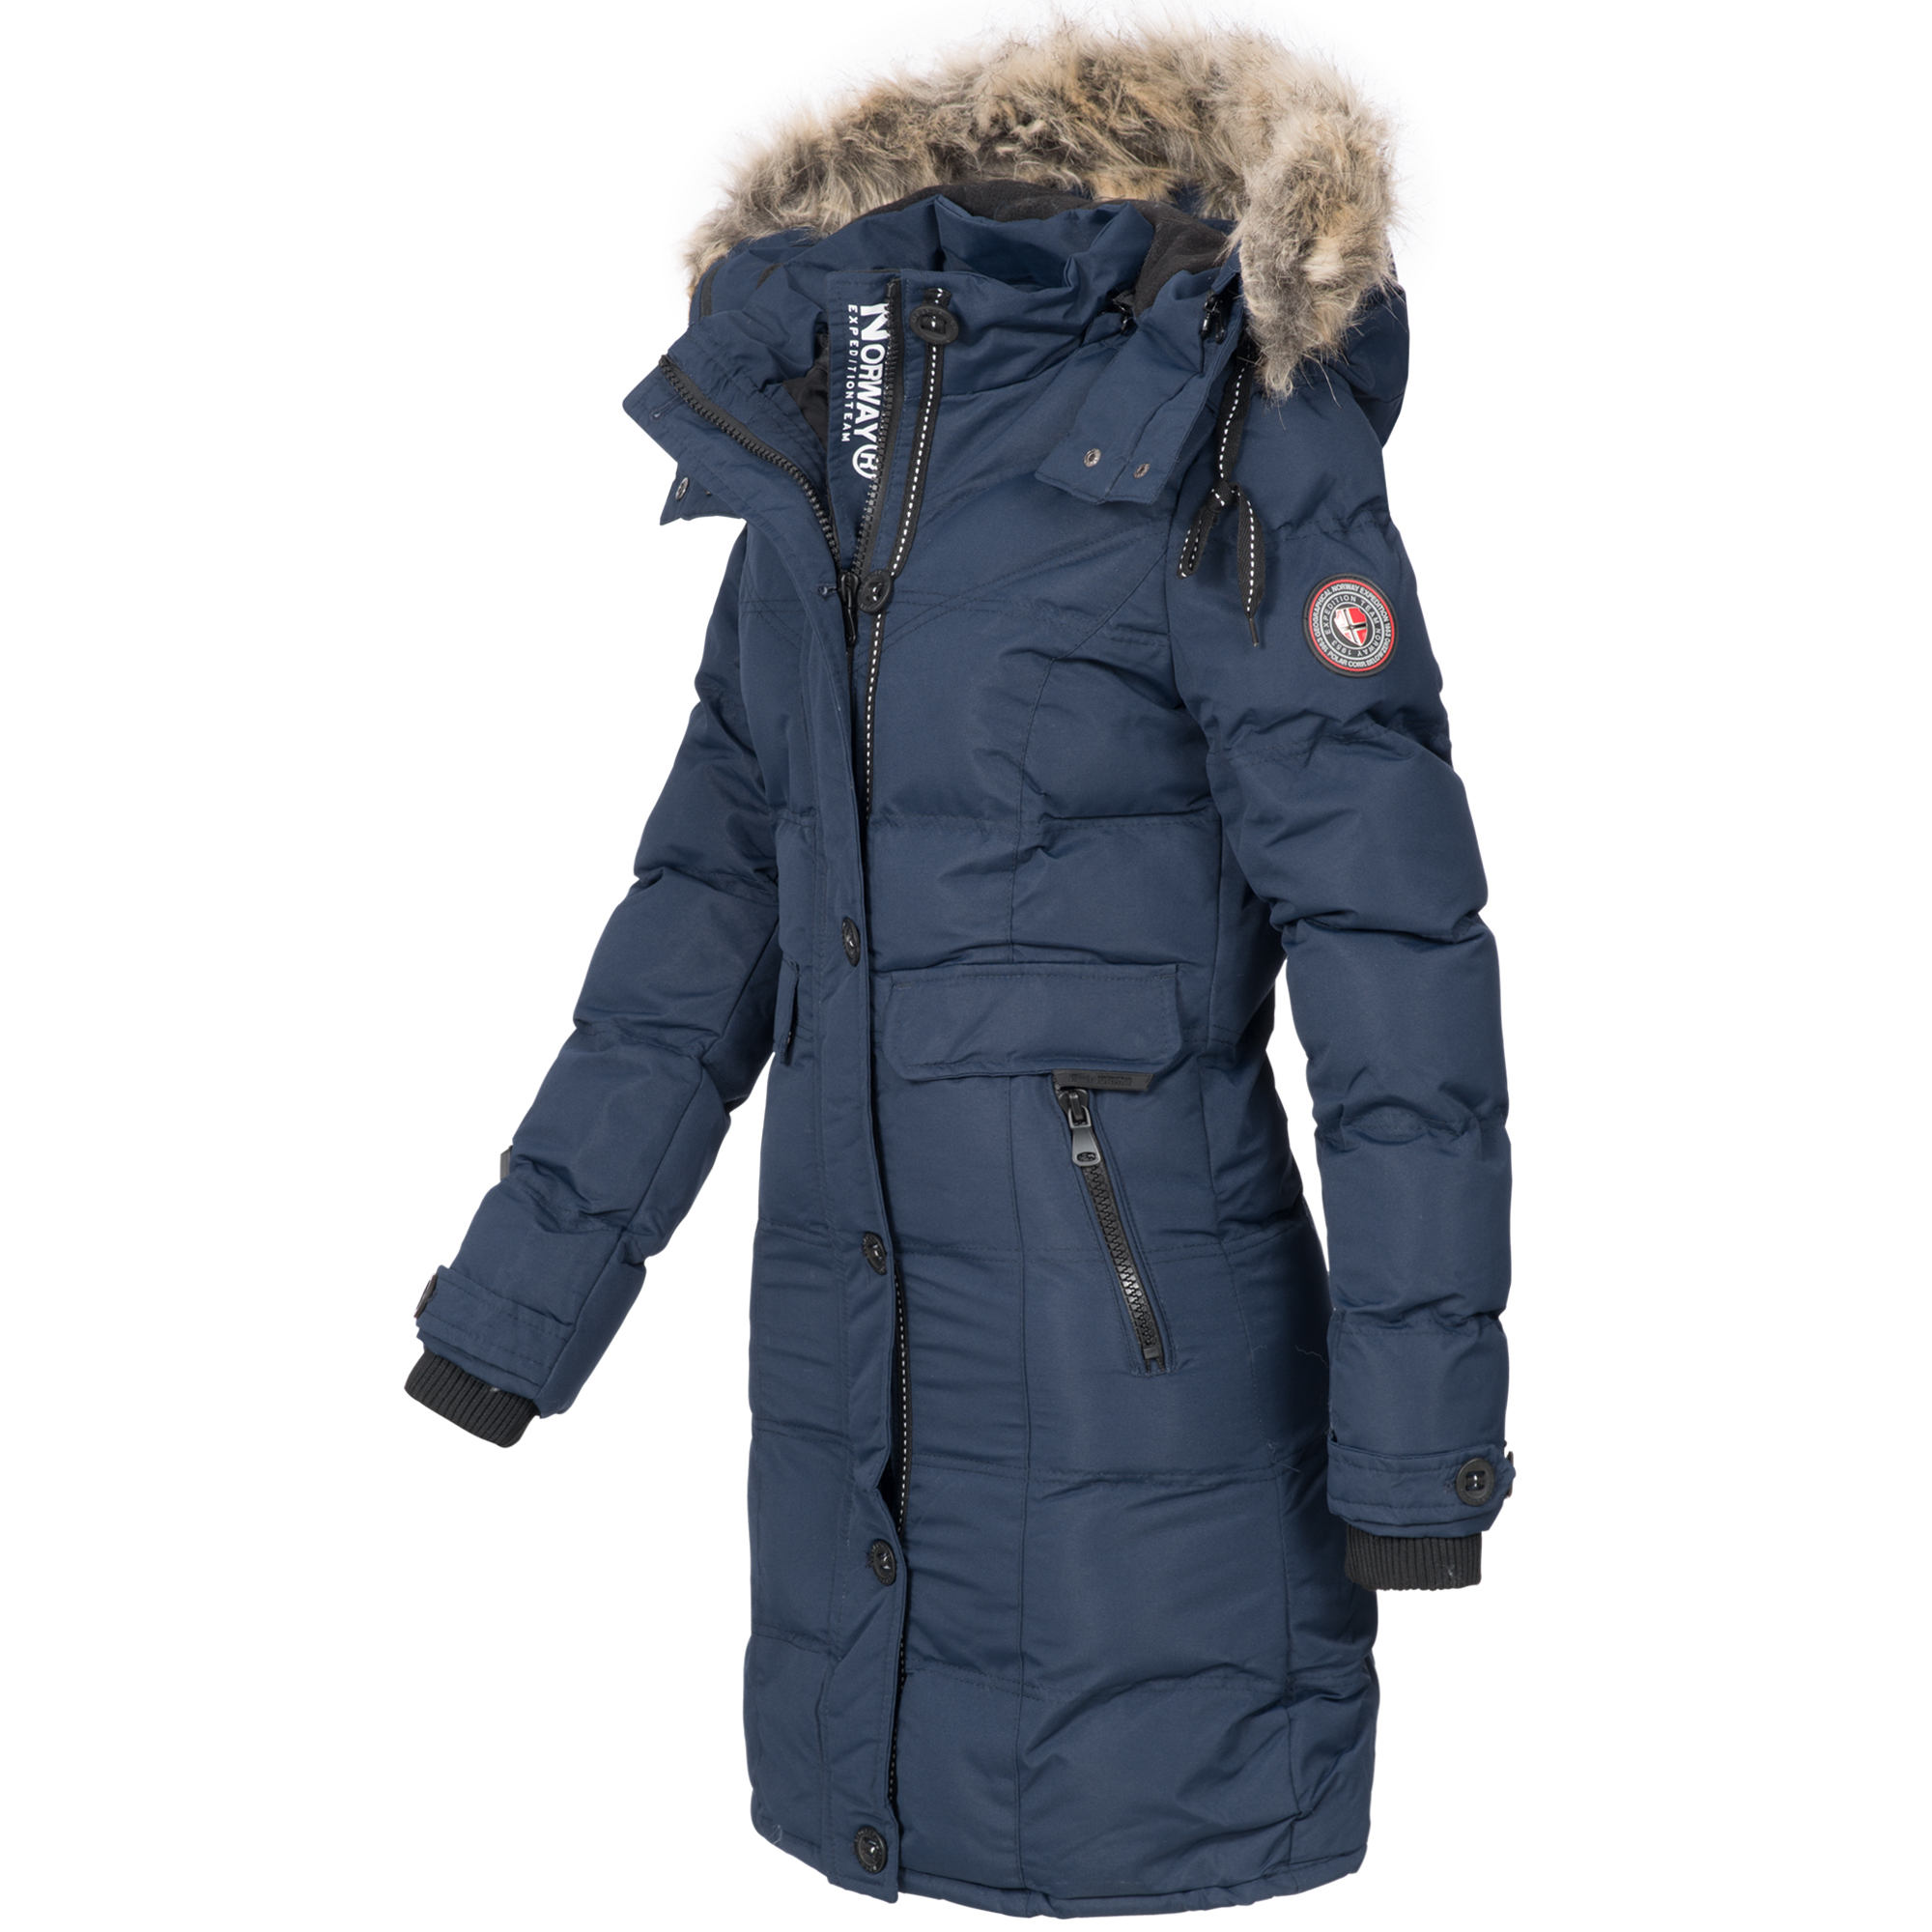 Neues Produkt 66e53 cfdc4 winterjacke damen lang warm